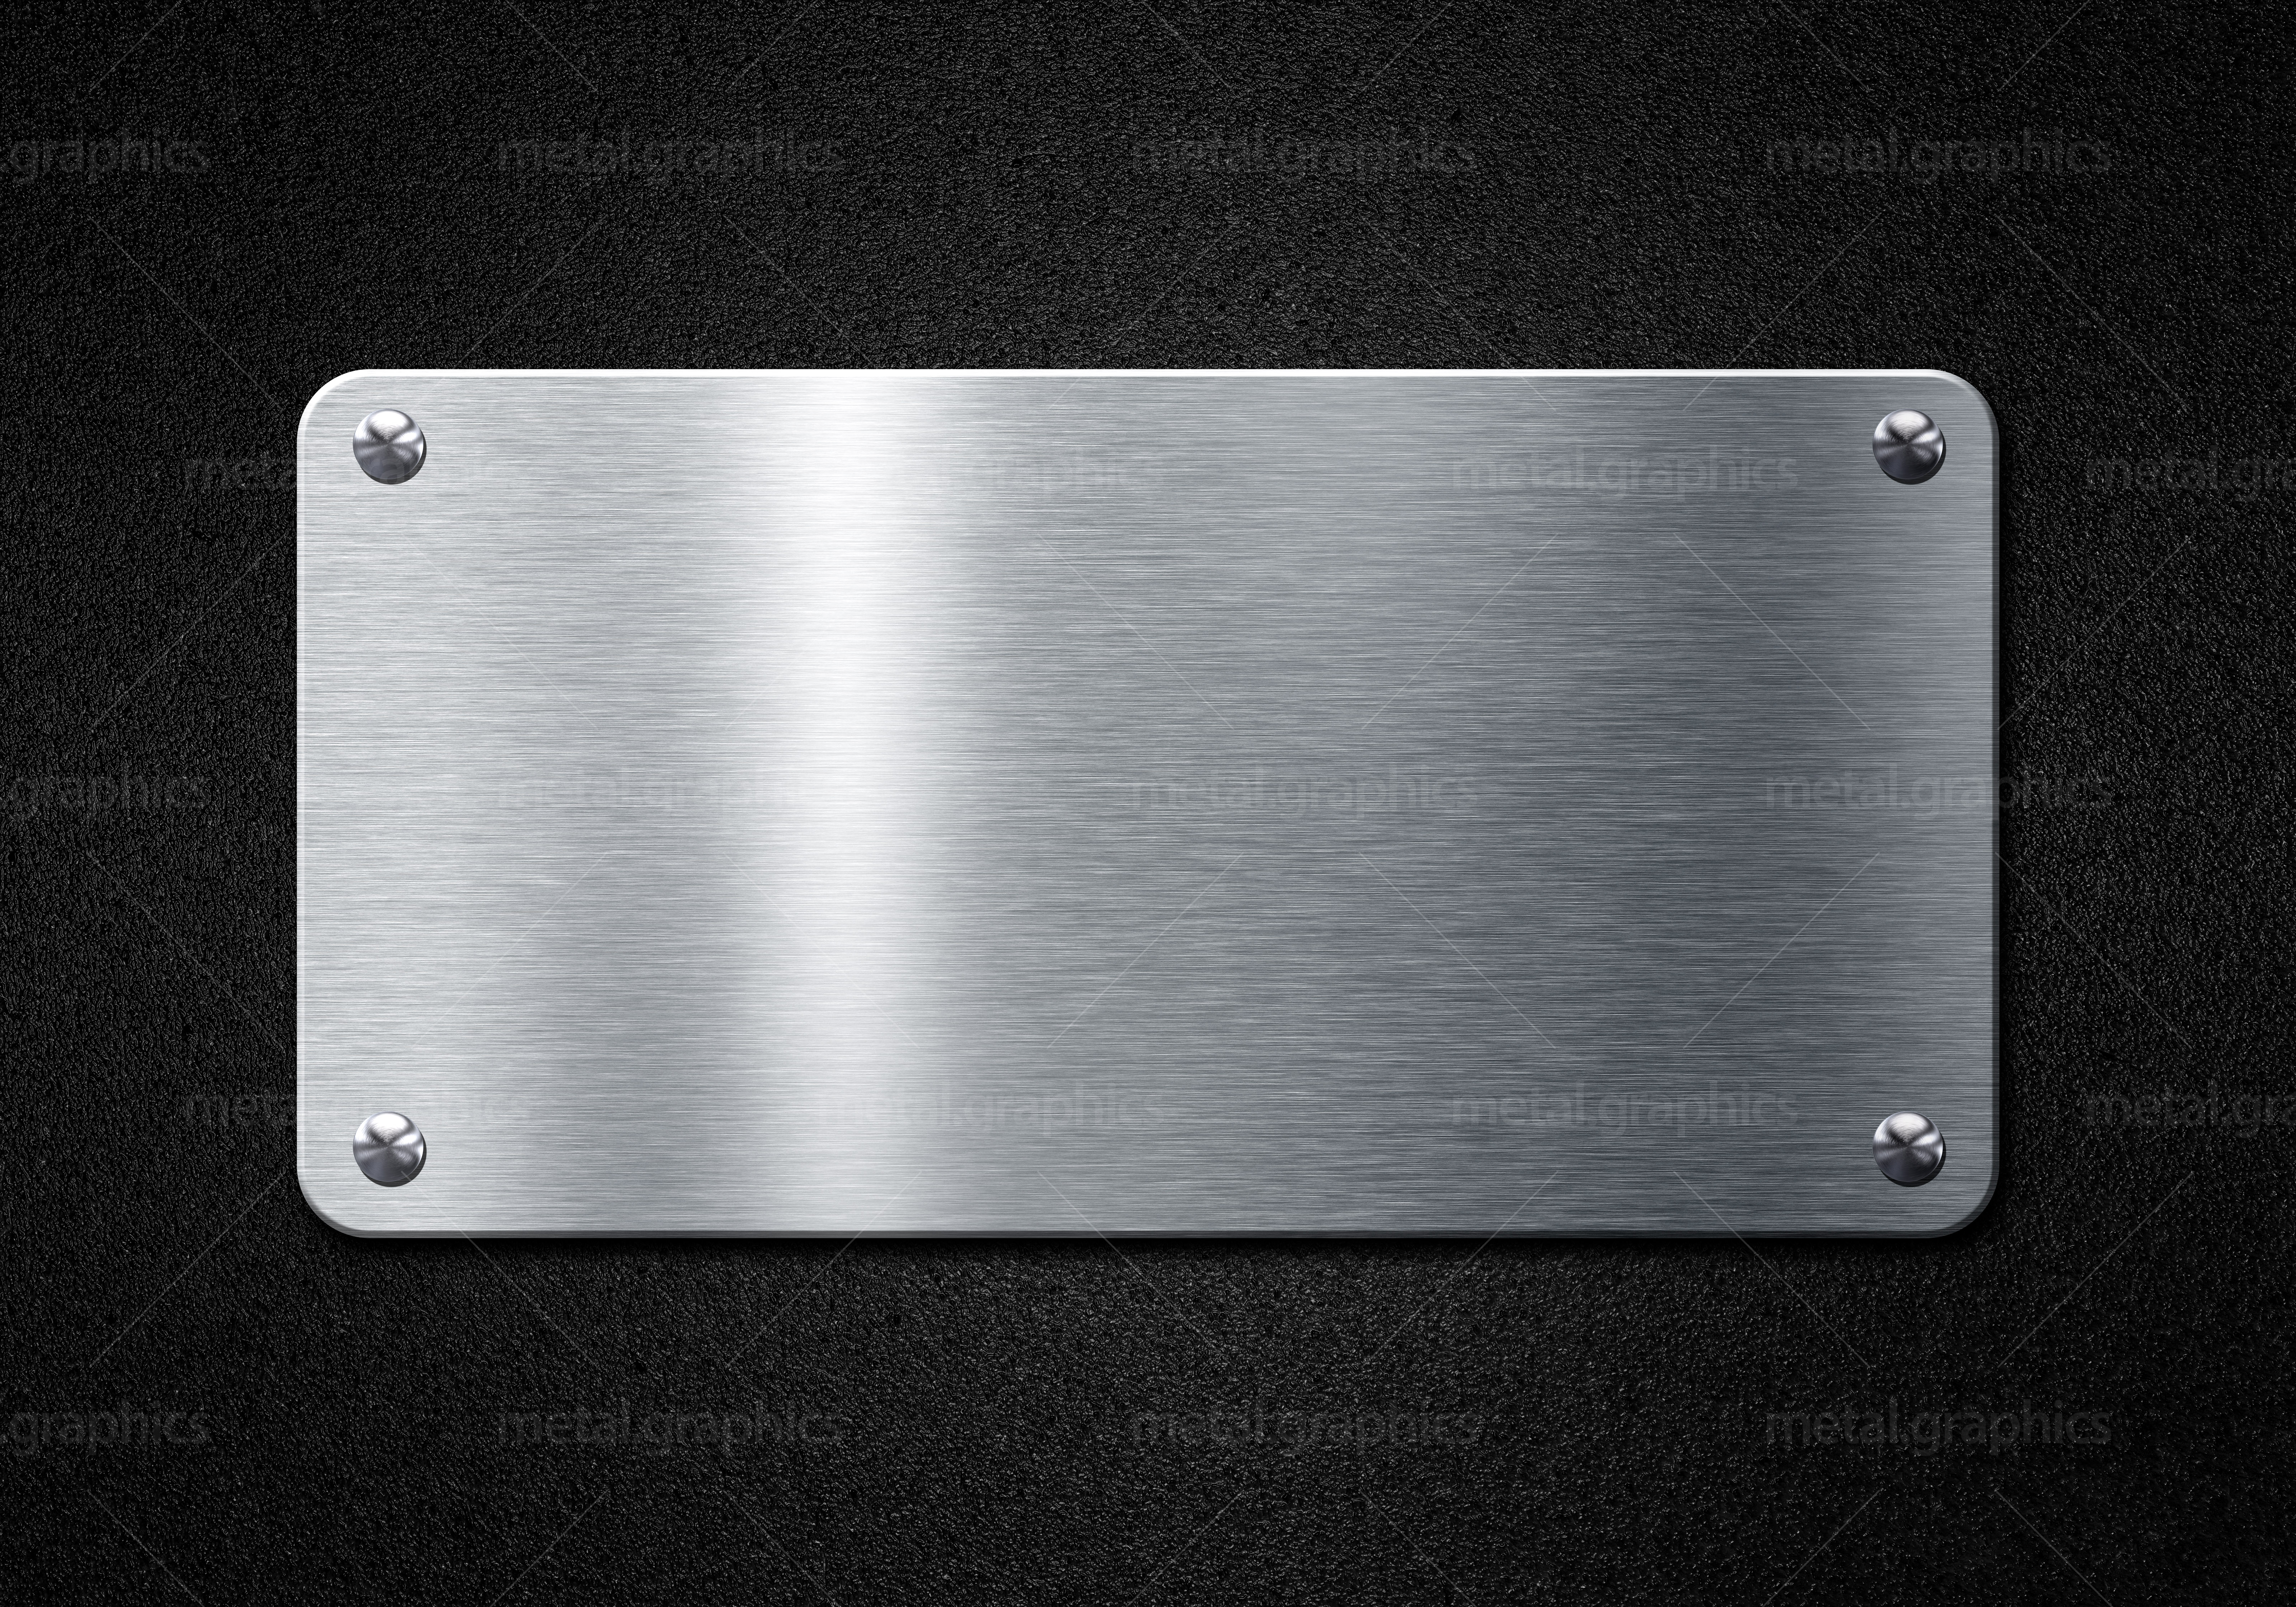 free photo  metal plate - screw  screws  scratched